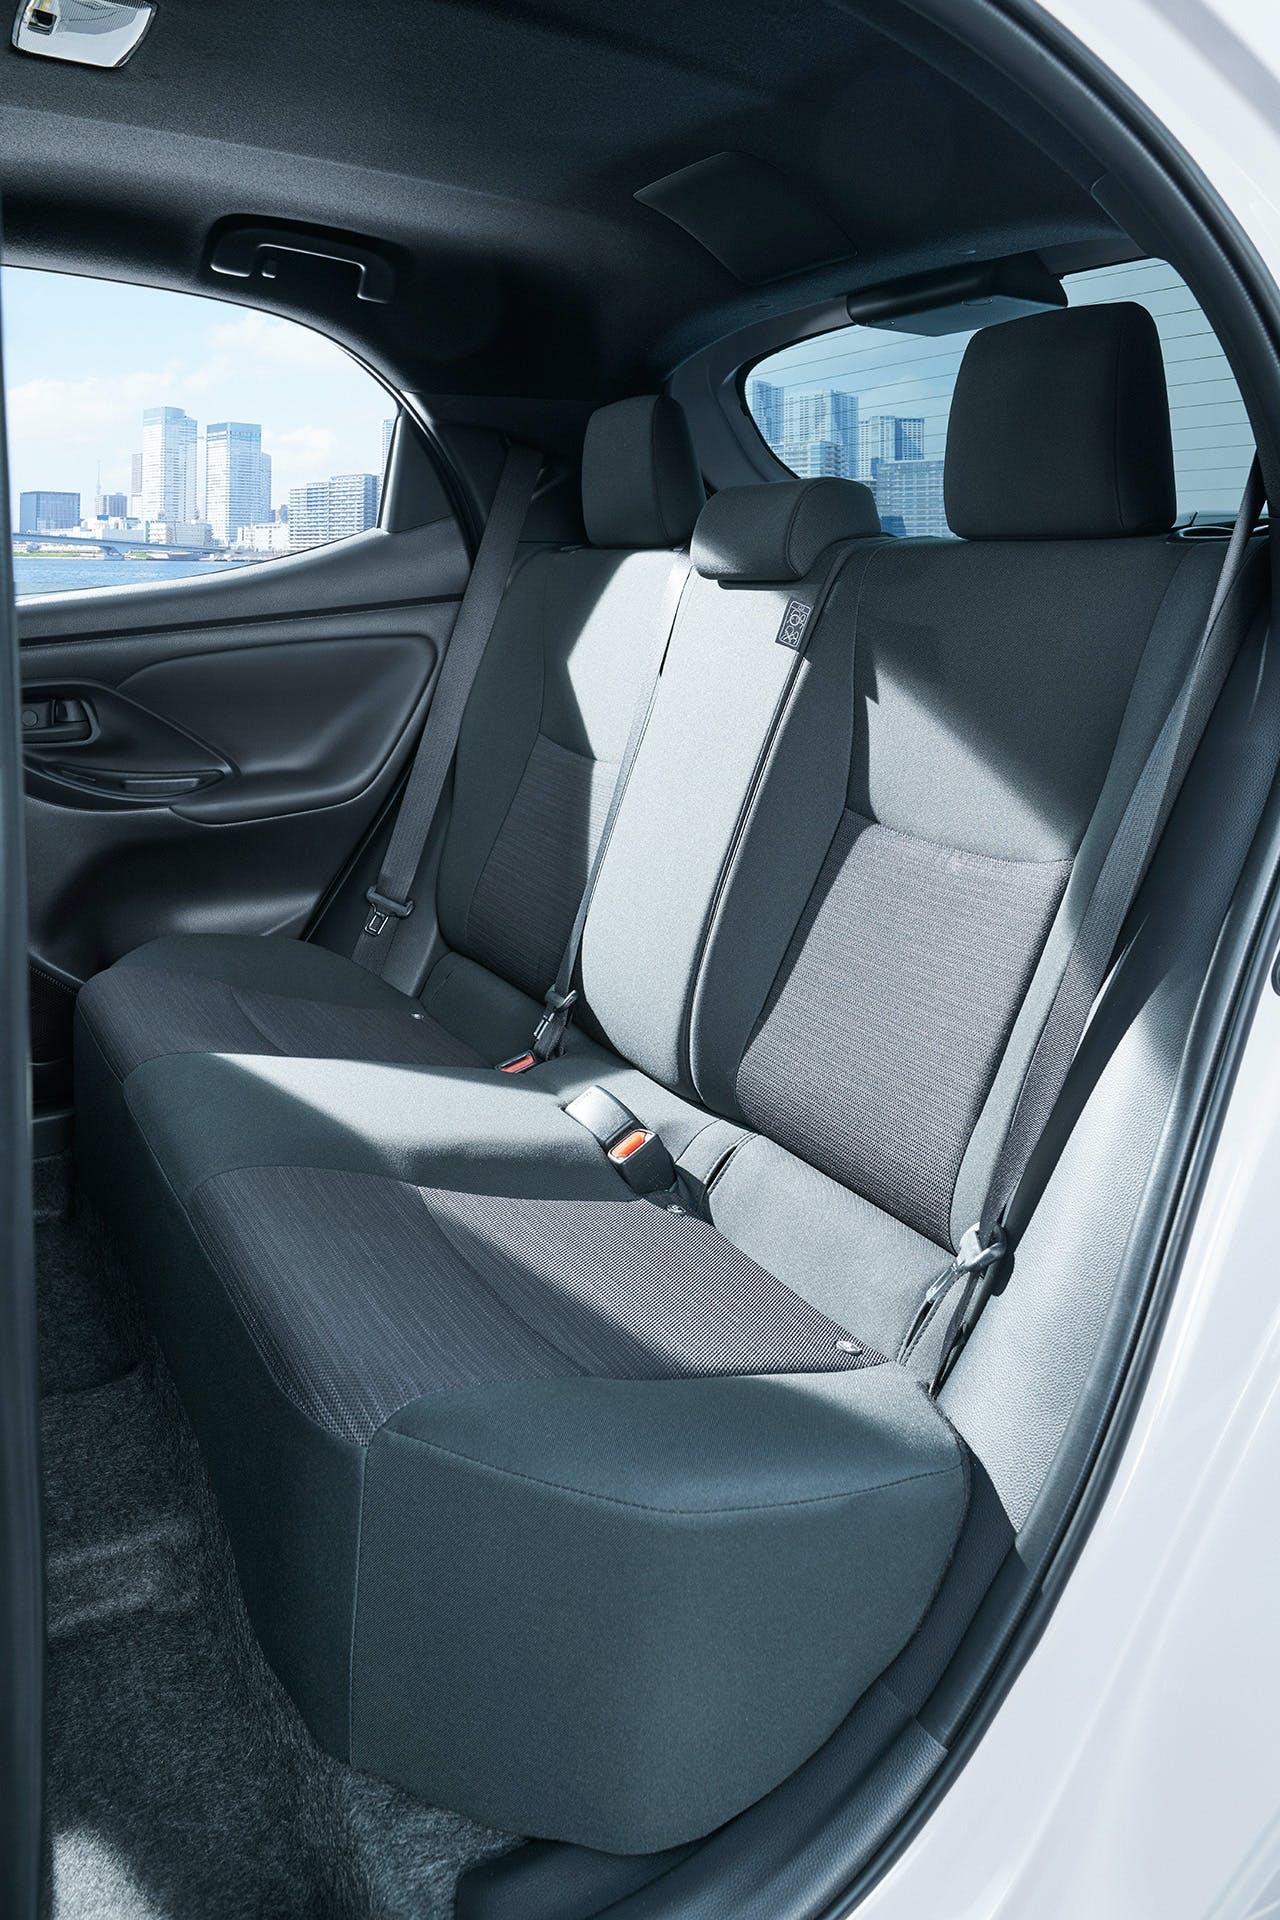 Nuova Toyota Yaris sedili posteriori